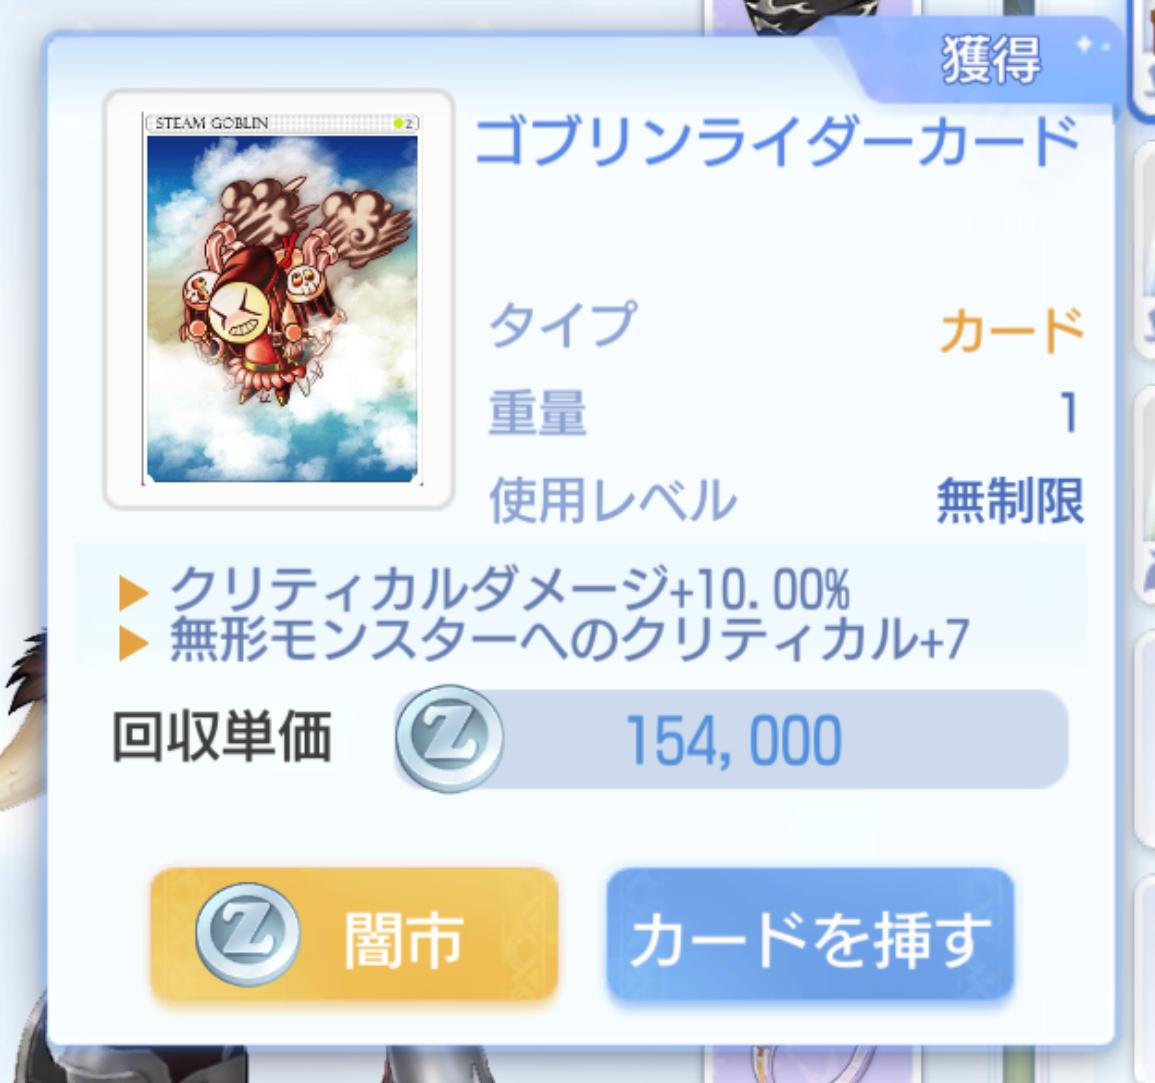 f:id:yamada_ragnarok:20210807035423p:plain